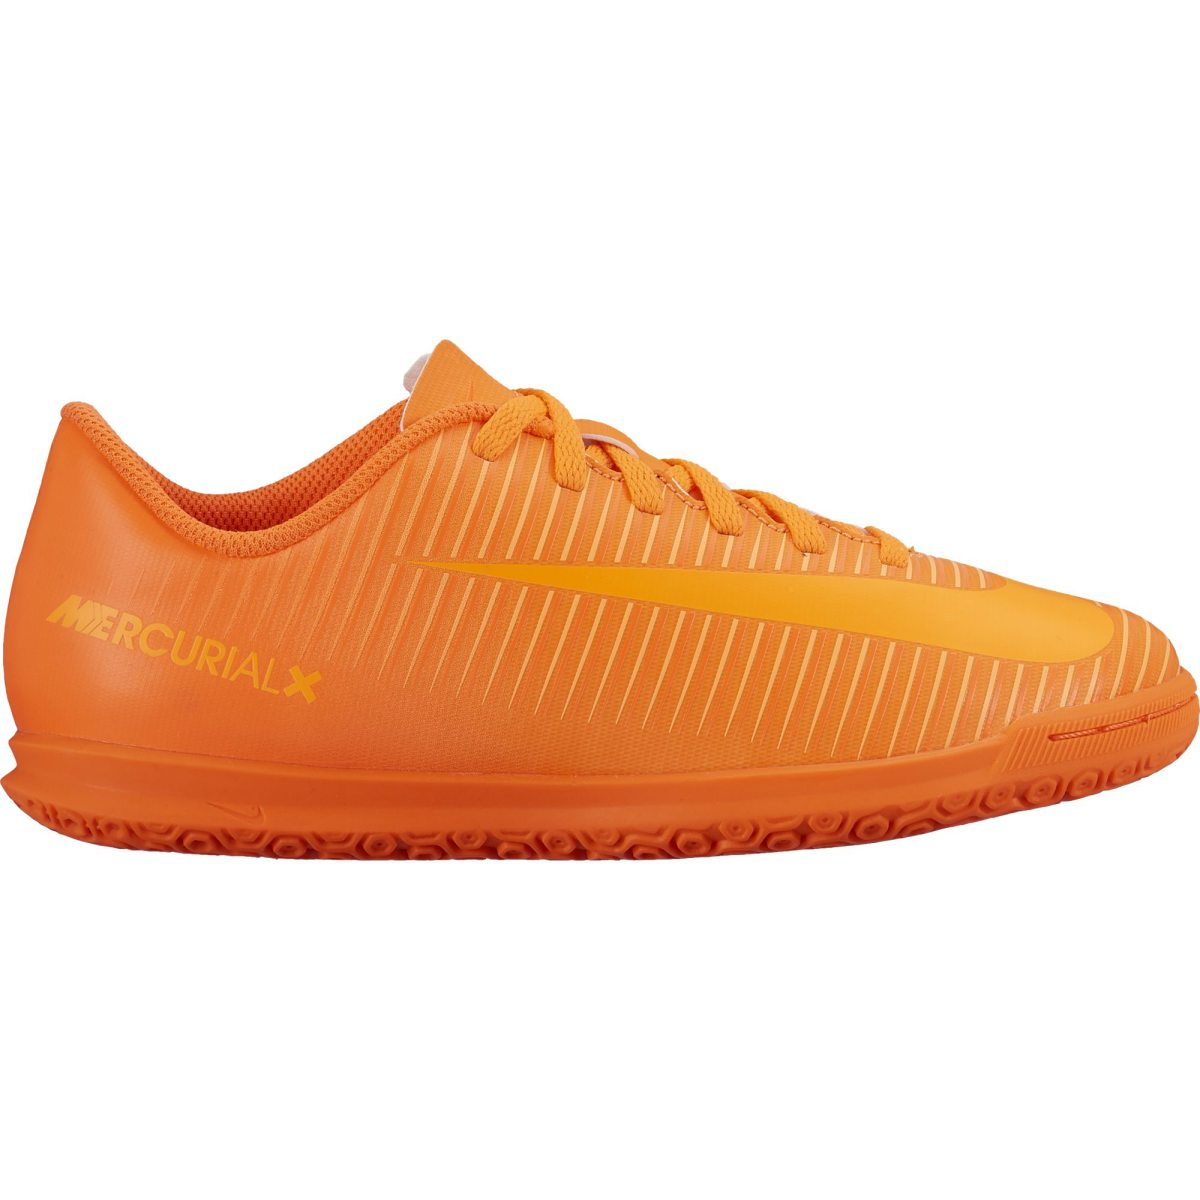 purchase cheap f66f5 907e6 nike mercurialx vortex iii ic futsalsko junior fotbollsskor